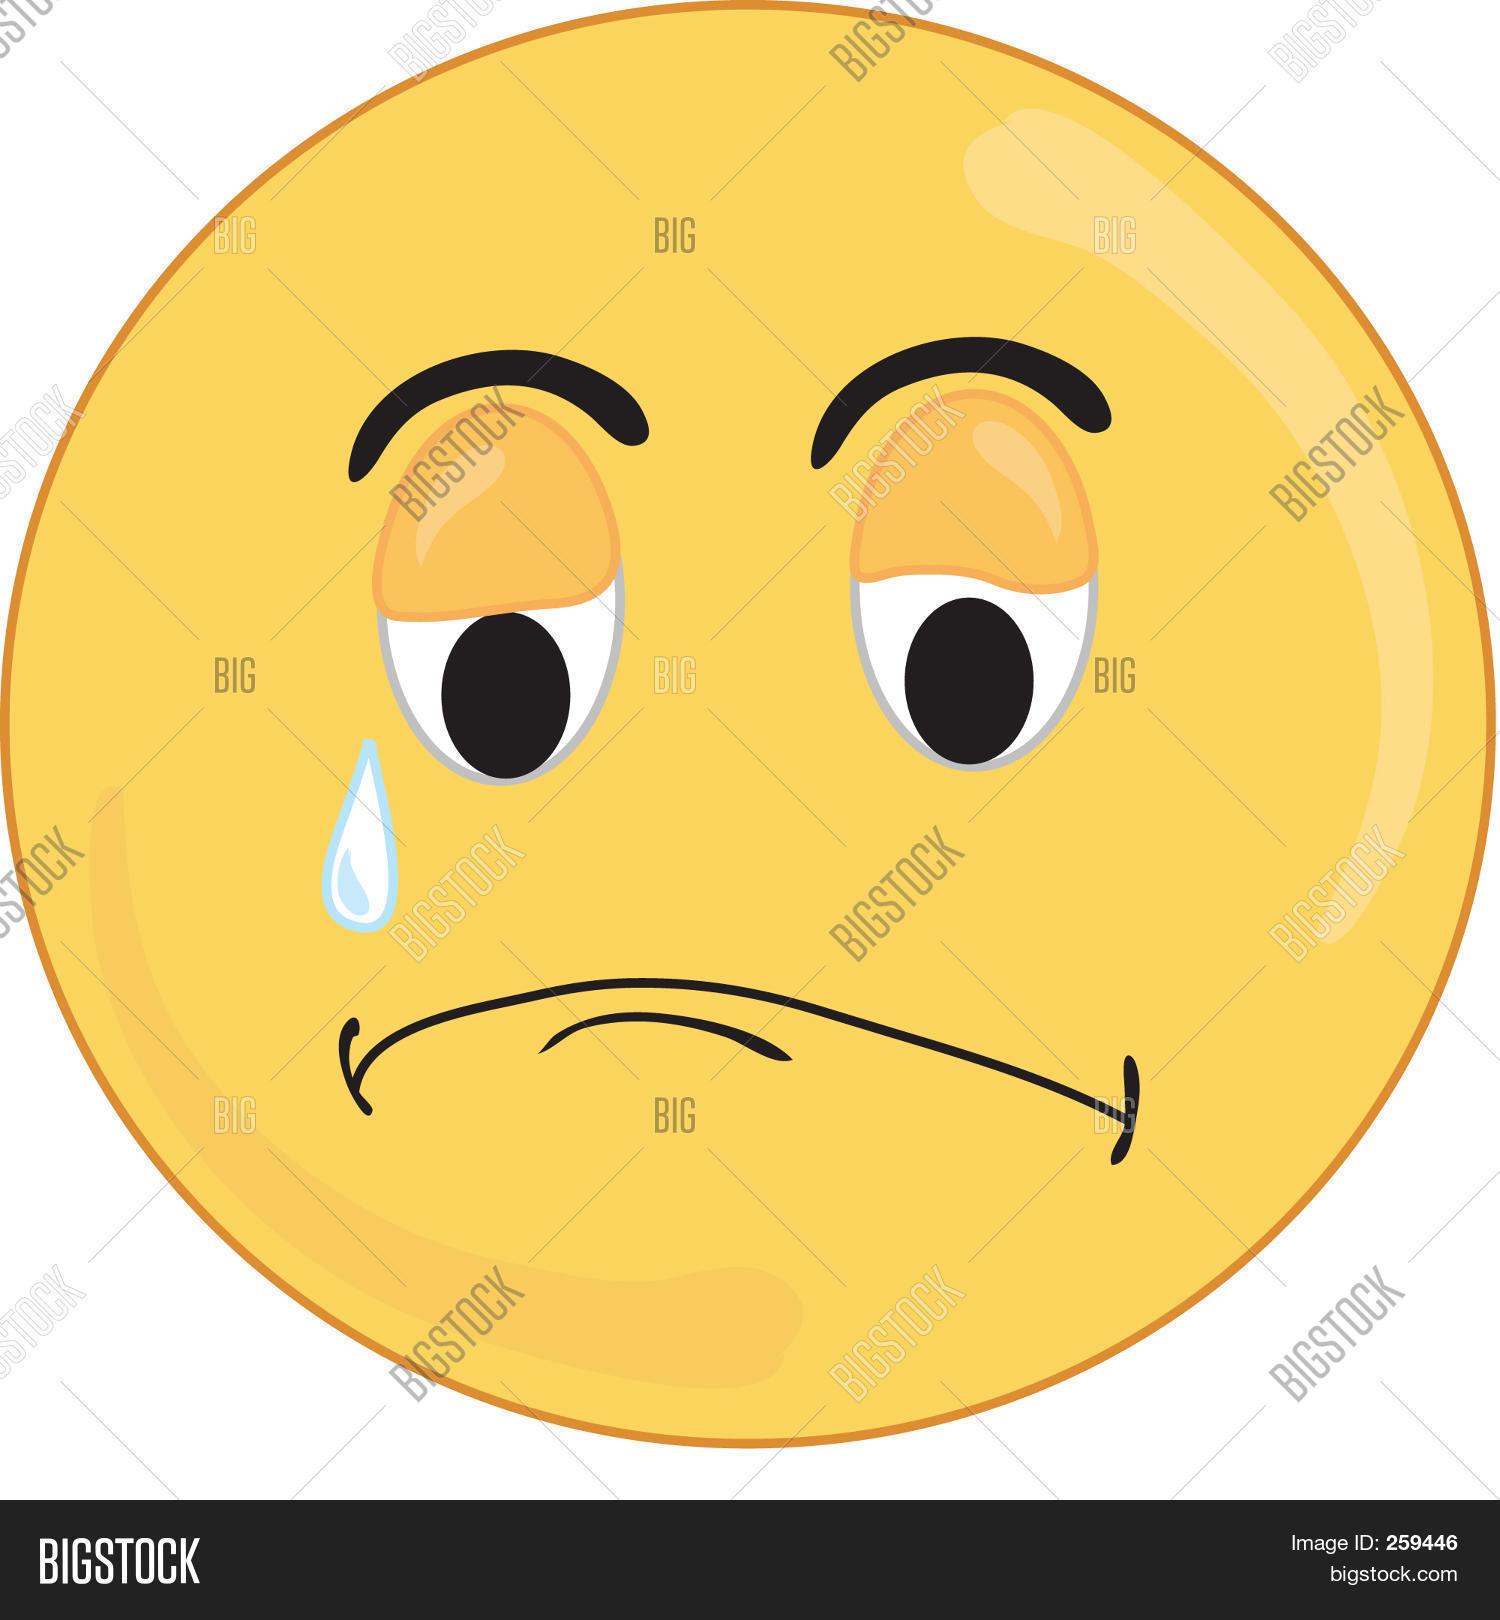 Sad smiley face images illustrations vectors sad smiley face sad face buycottarizona Choice Image